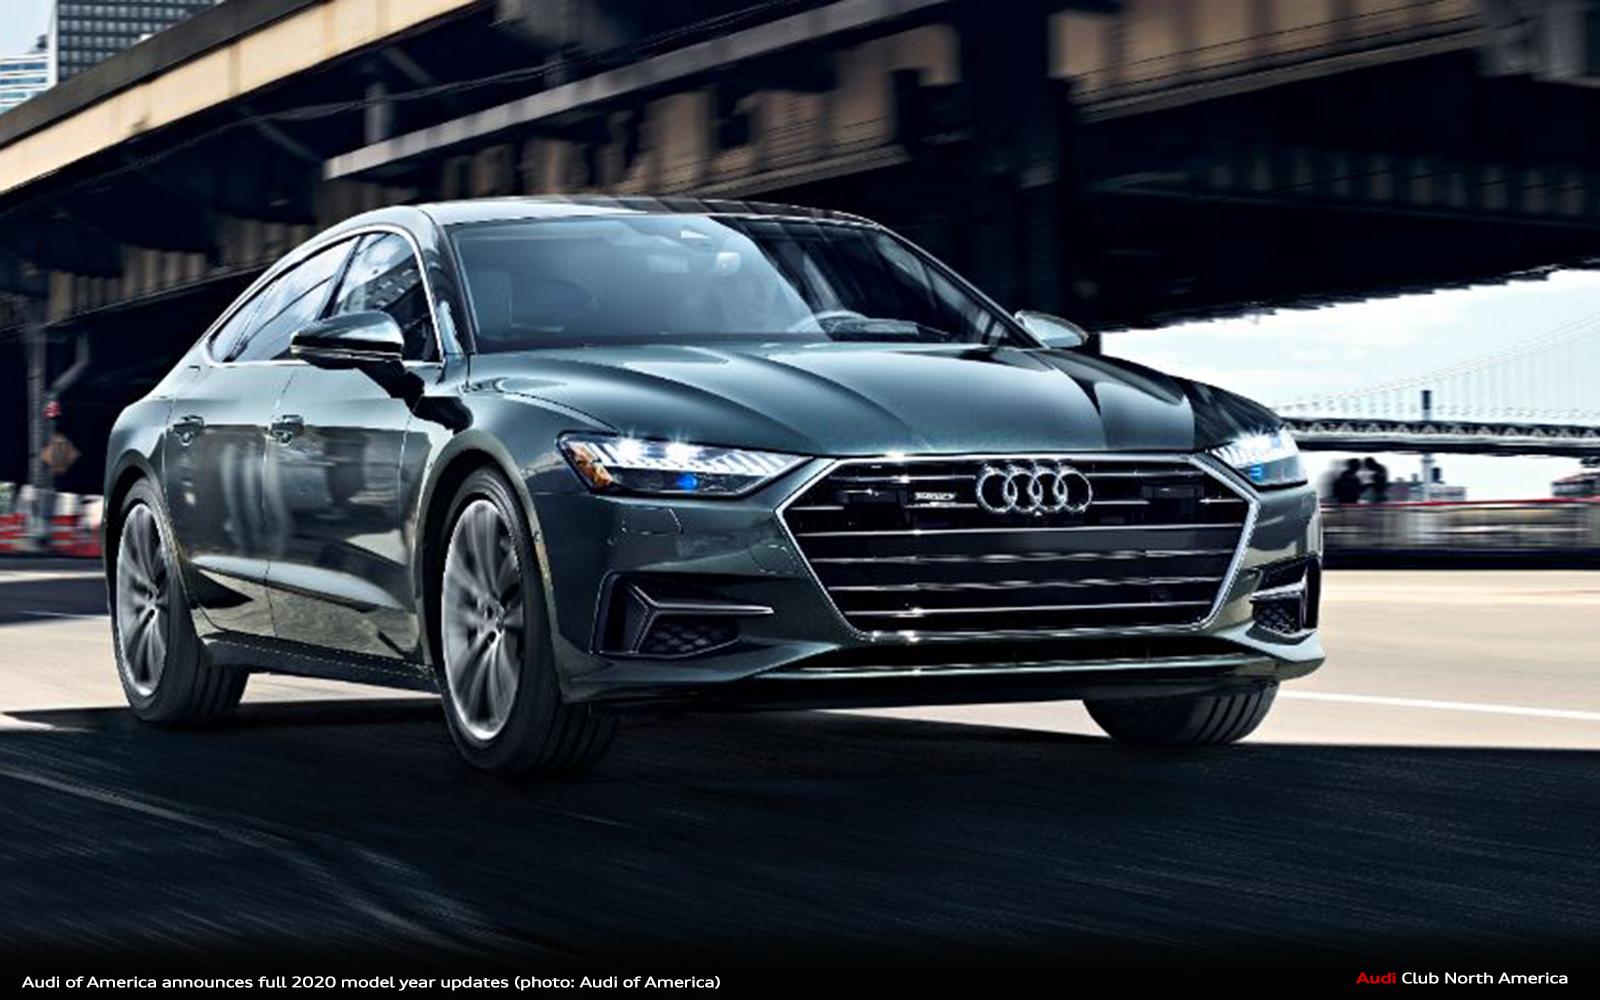 Audi of America Announces Full 2020 Model Year Updates